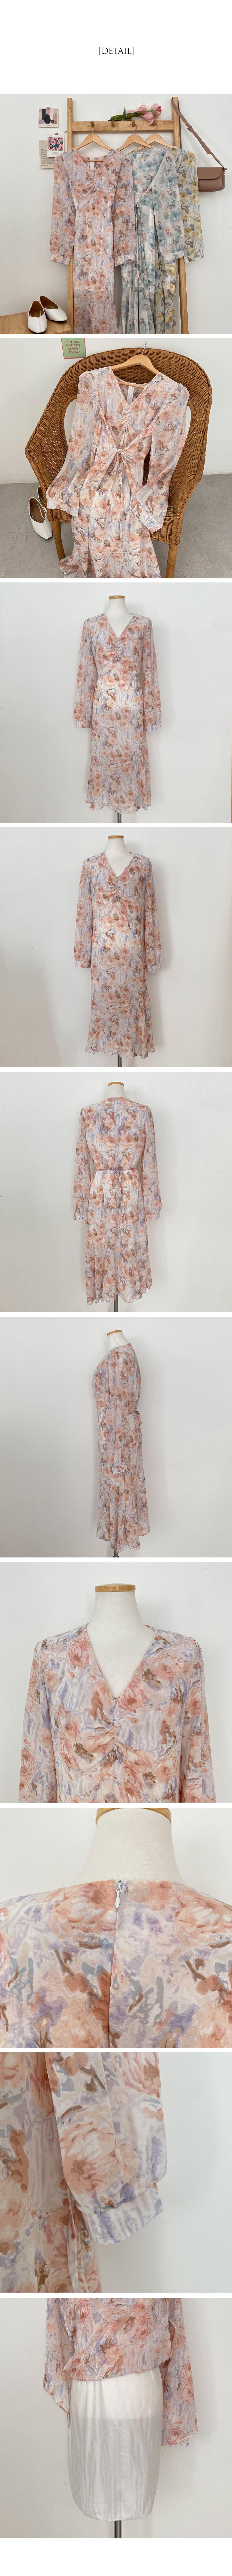 One drop of paint, flower mermaid long Dress